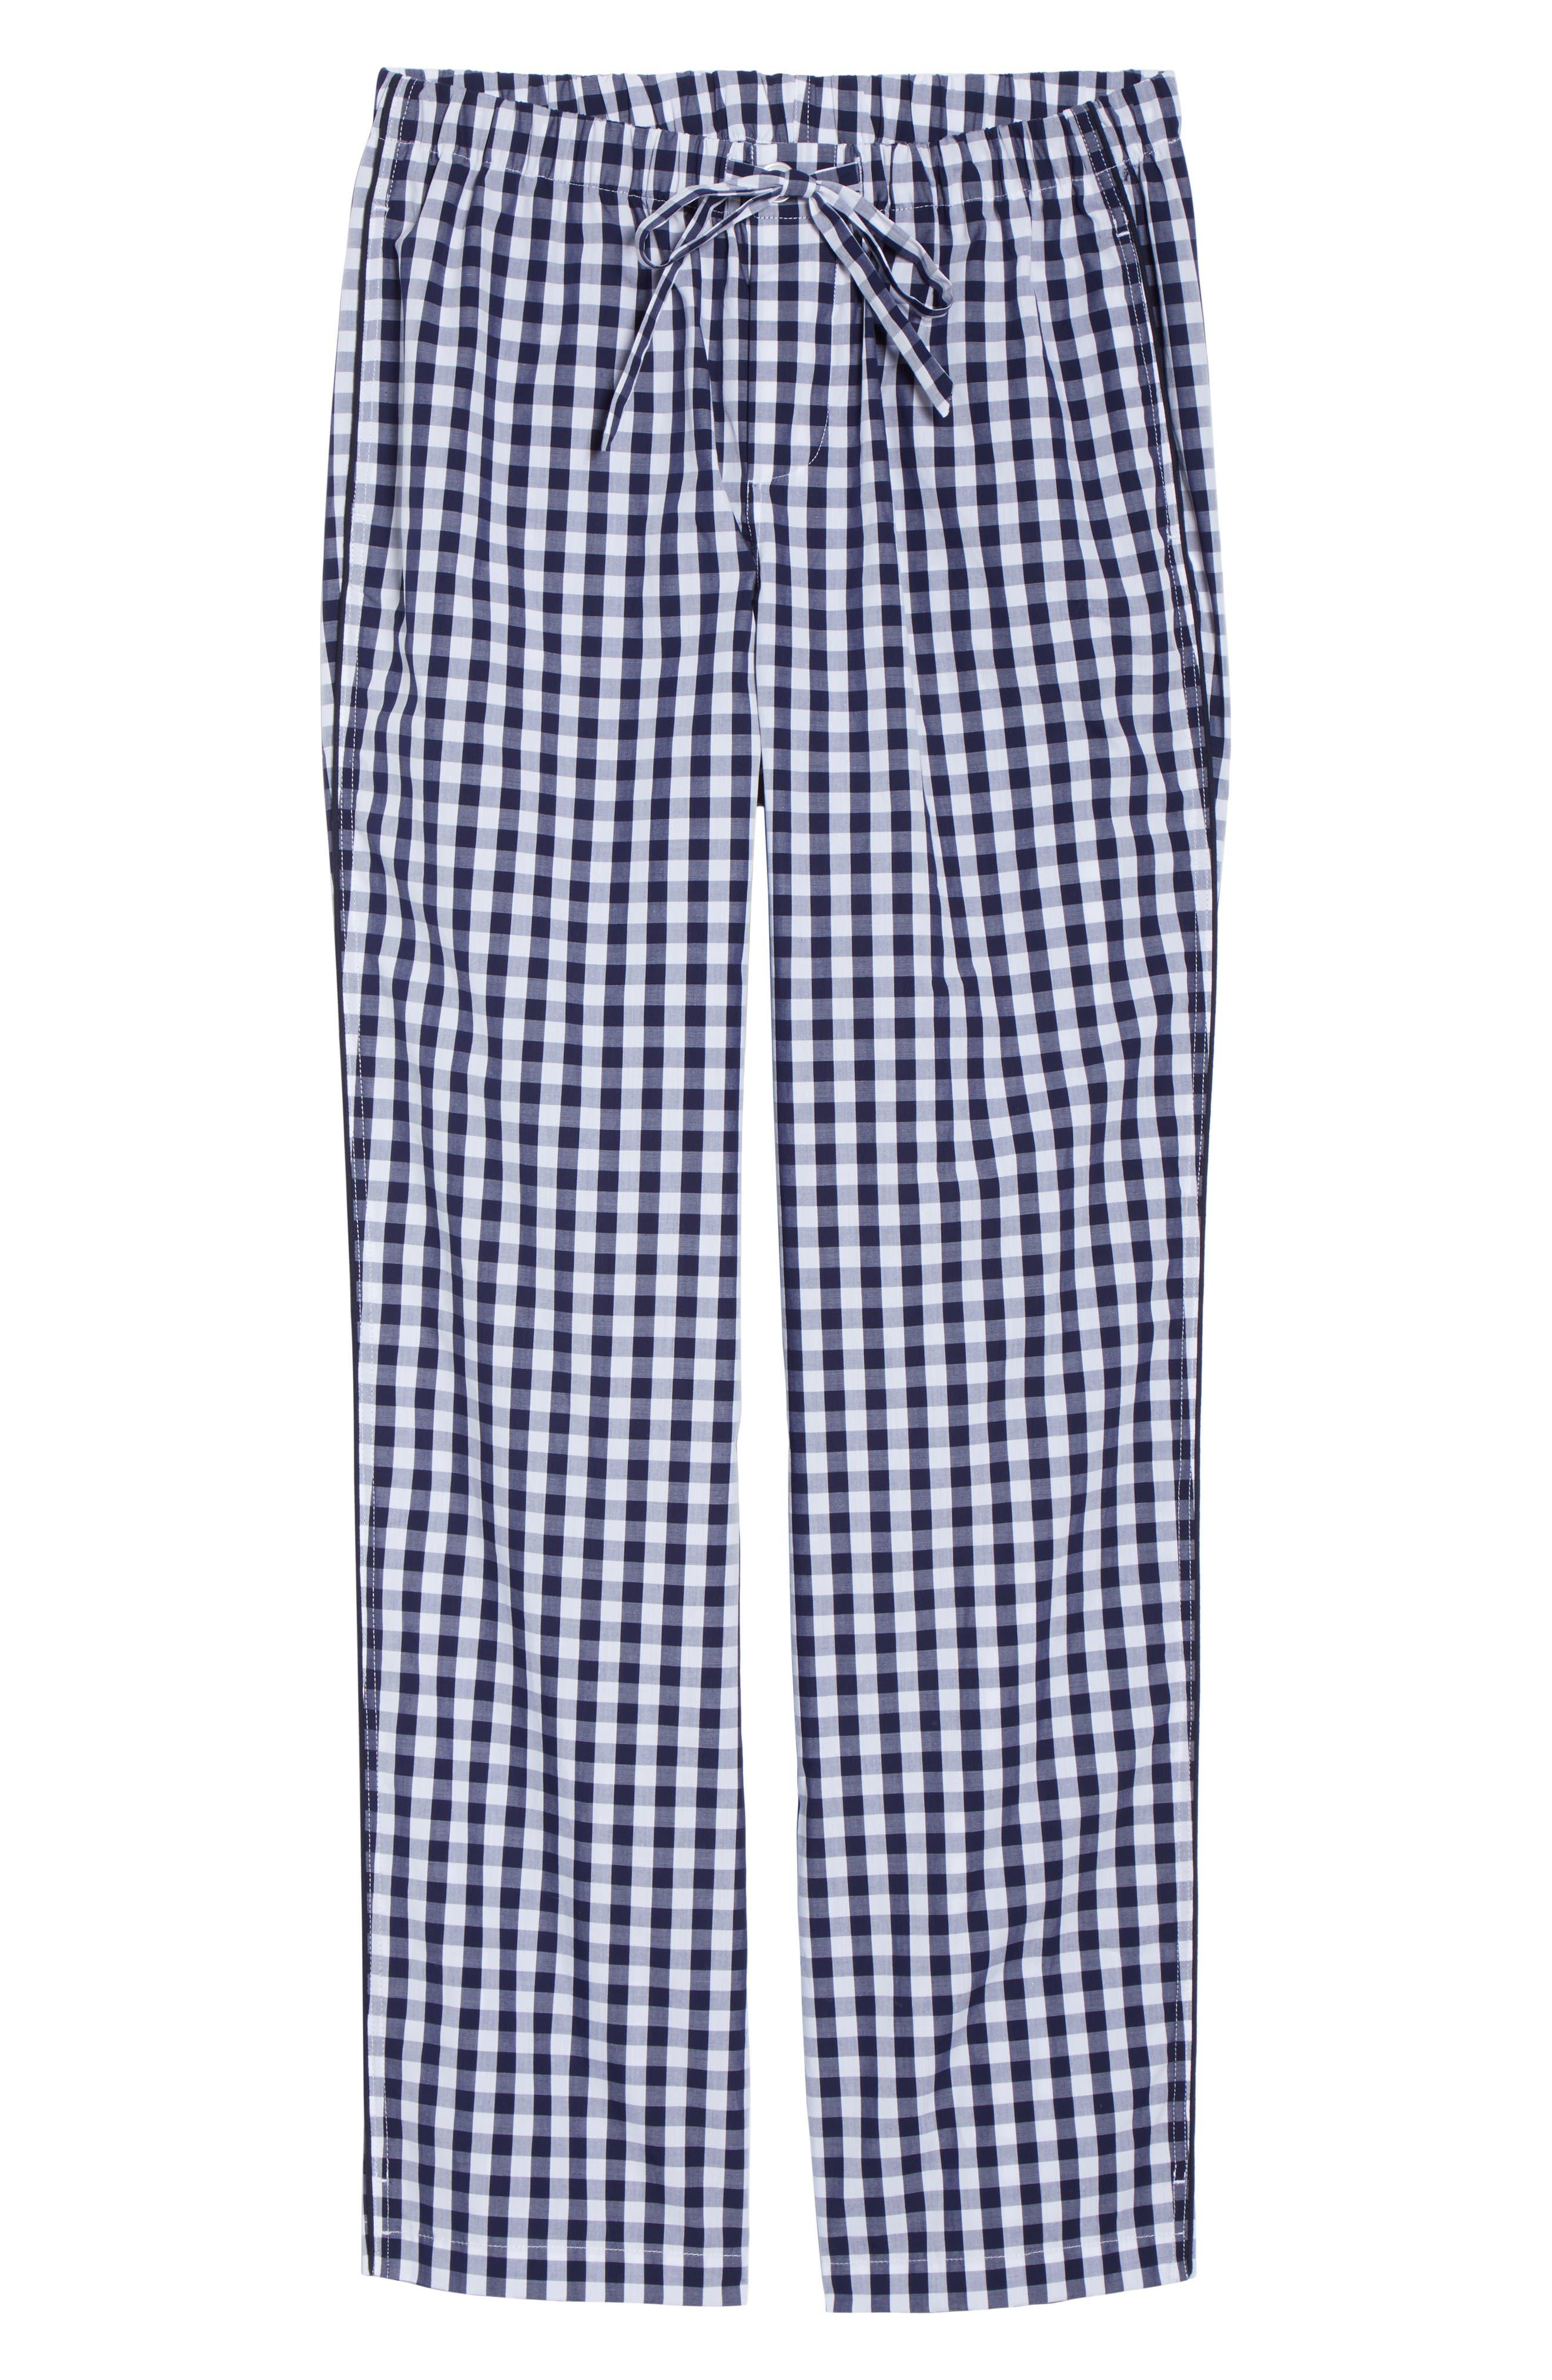 Marina Women's Pajama Pants,                             Main thumbnail 1, color,                             LARGE GINGHAM BLUE